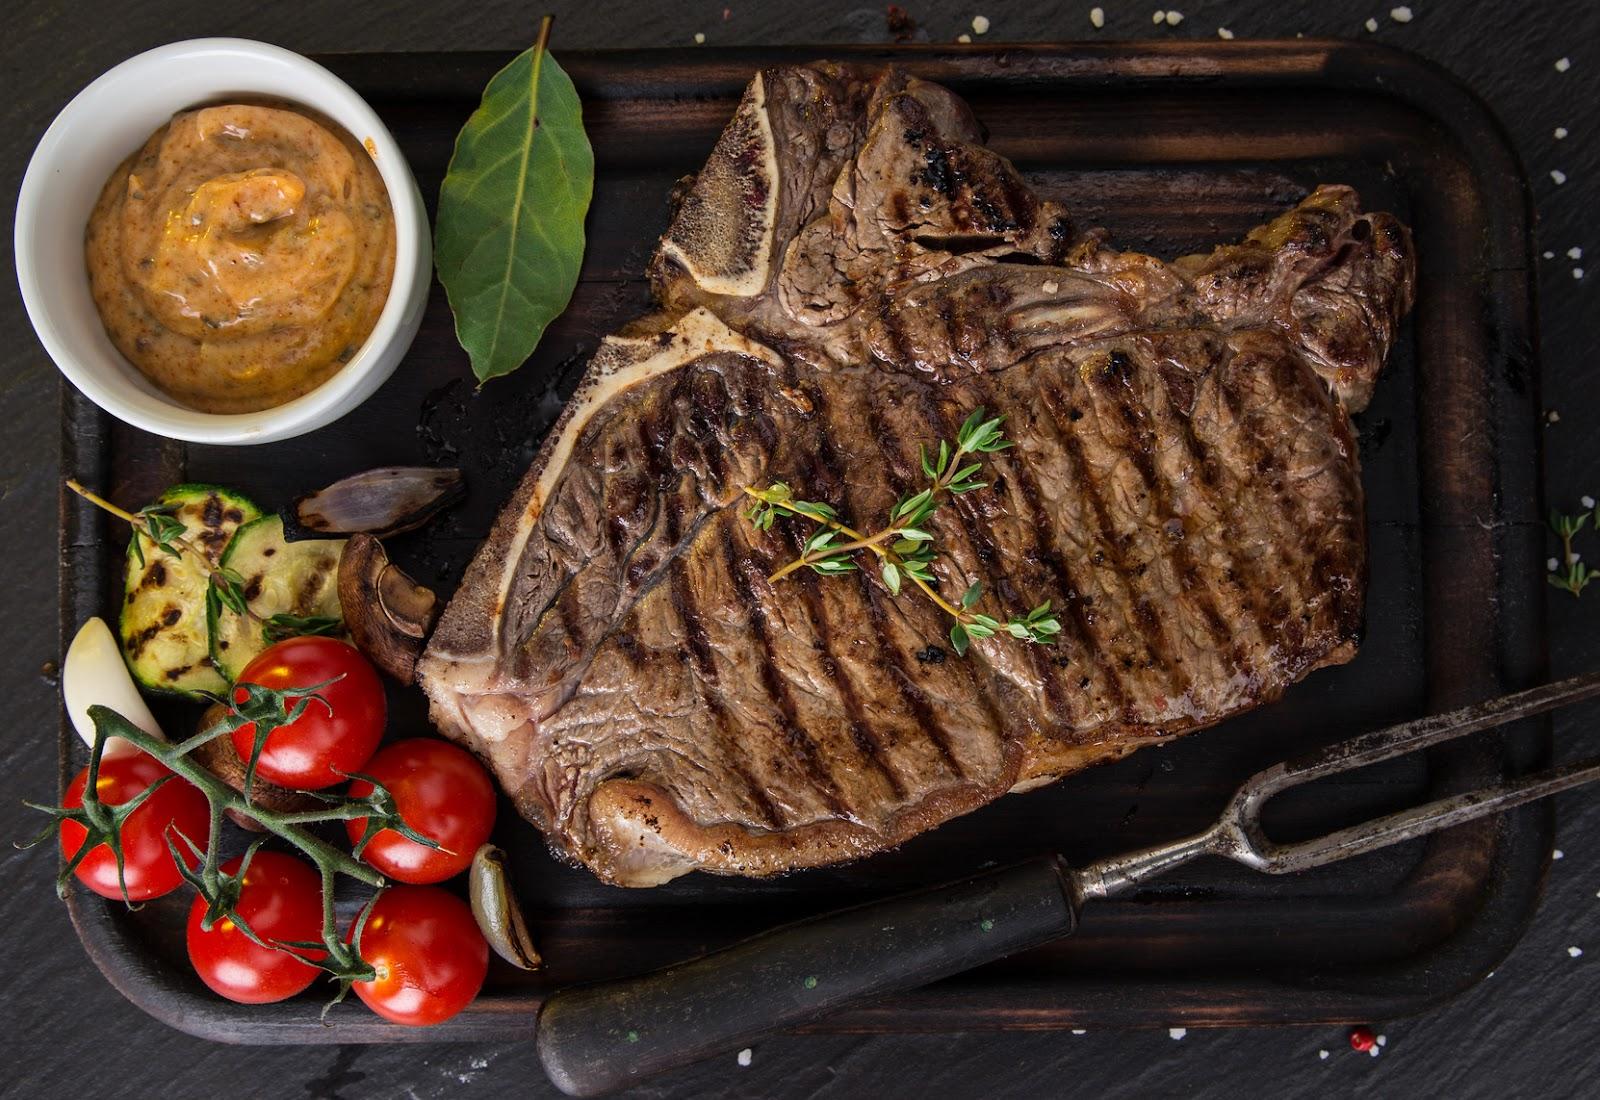 bistecca fiorentina.jpg